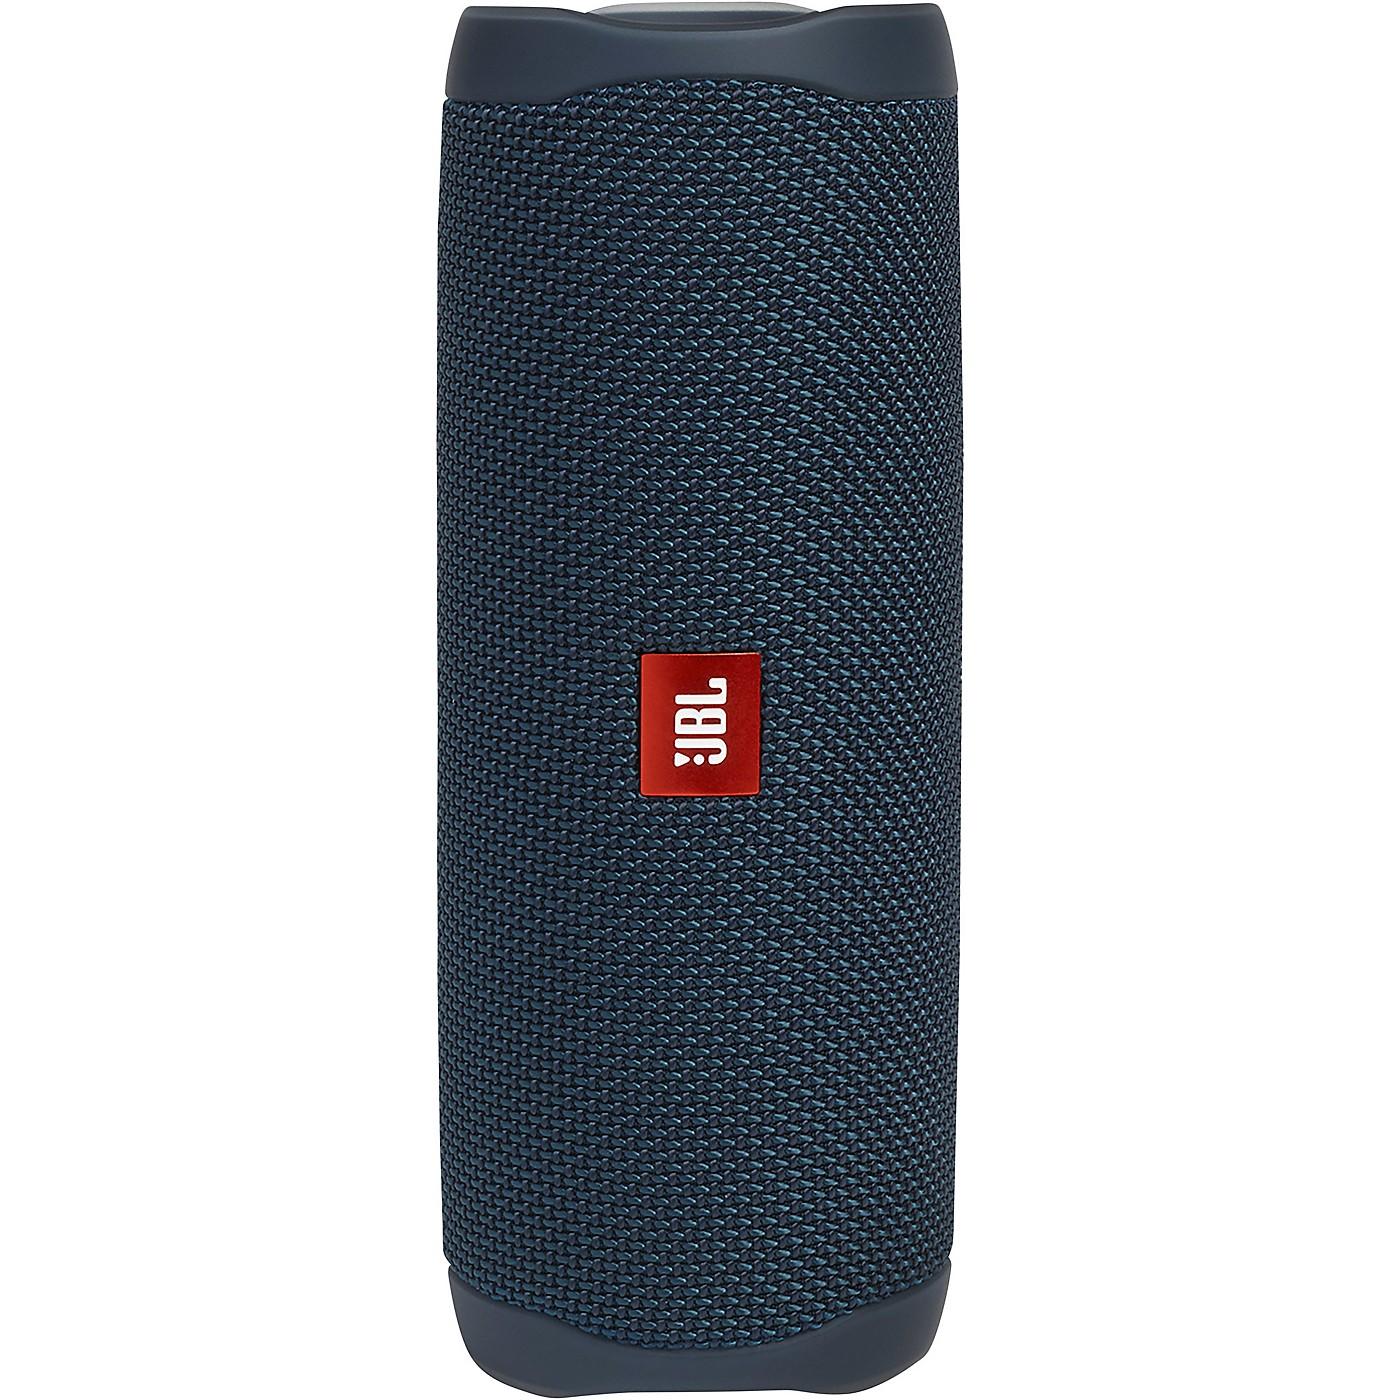 JBL FLIP 5 Waterproof Portable Bluetooth Speaker w/ built in battery and microphone thumbnail